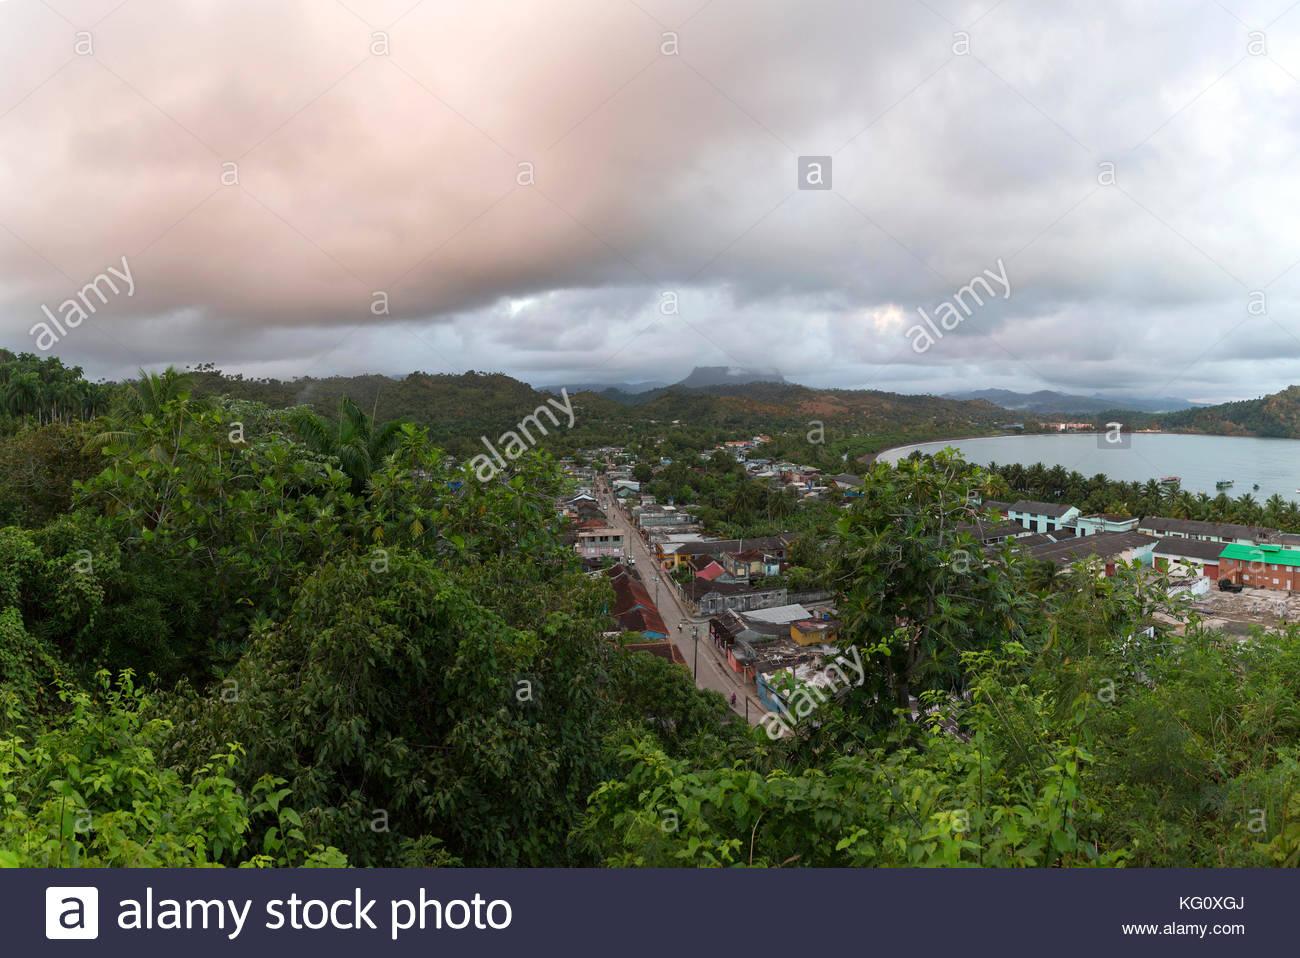 Stadtteil von Baracoa mit dem Tafelberg El Yunque im Hintergrund, , Kuba Engl.: Cuba, Baracoa, suburb with table - Stock Image